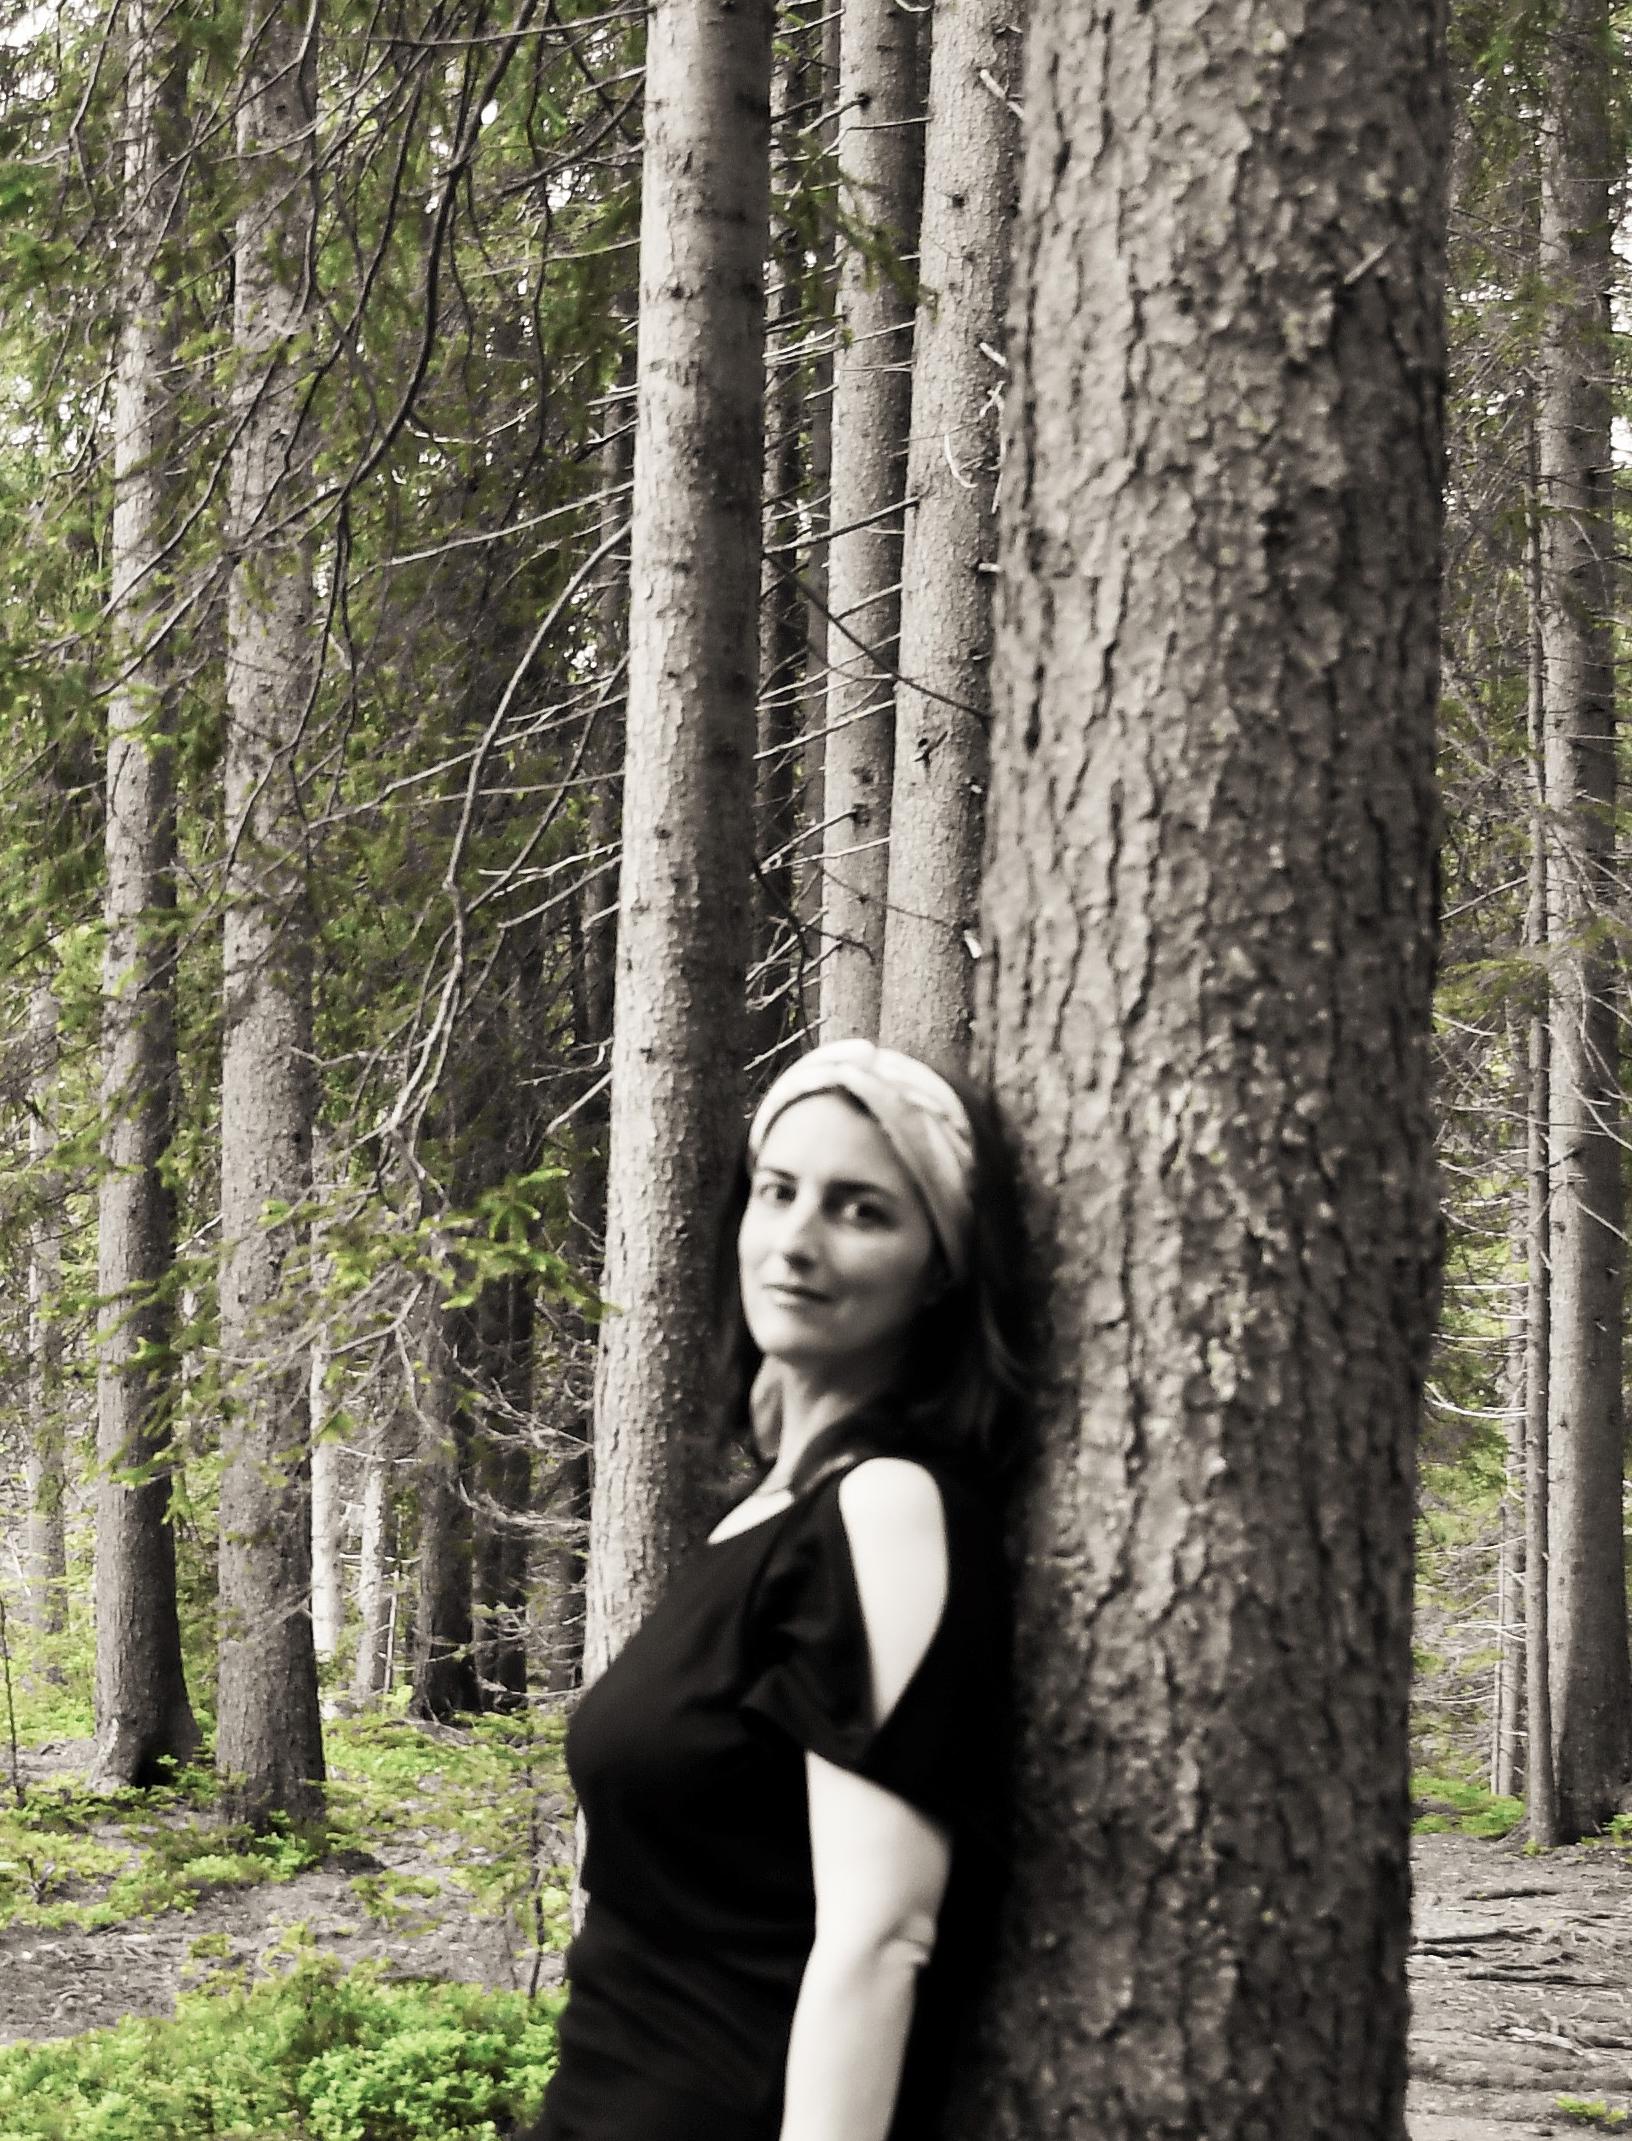 Nathalie Hosp Yoga, Räubertochter Fotos, Masern